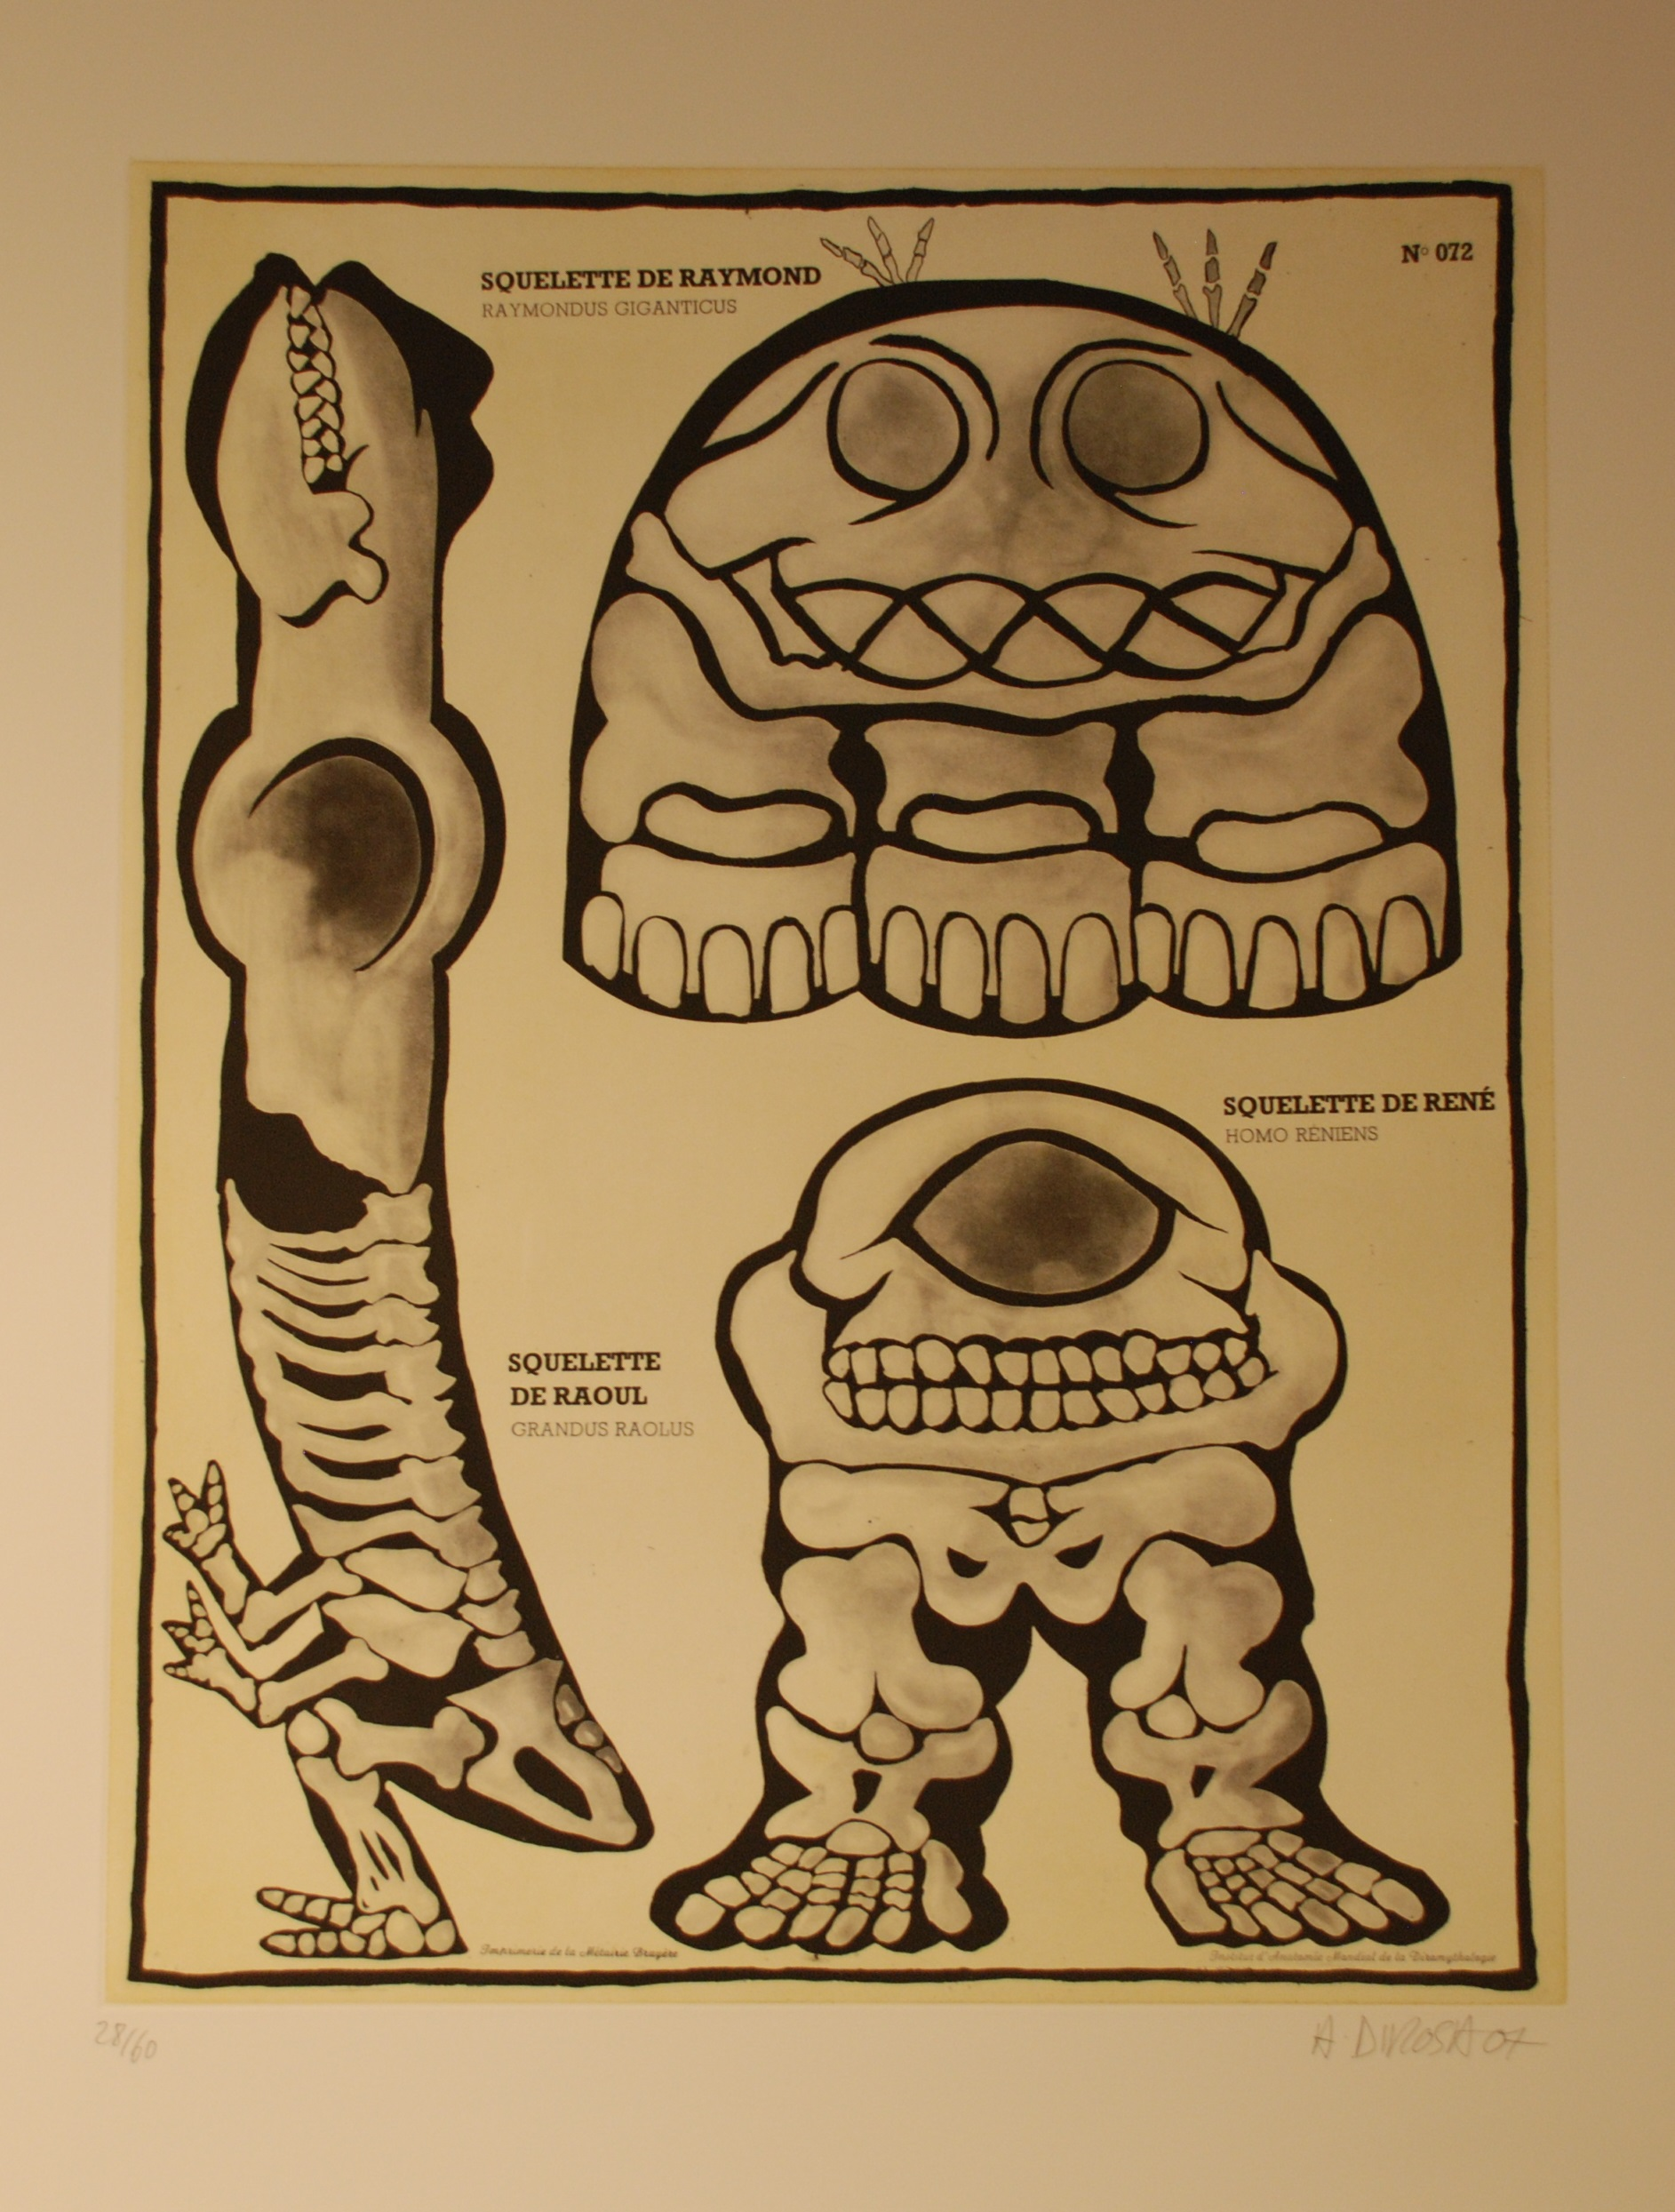 Squelette de Raymond